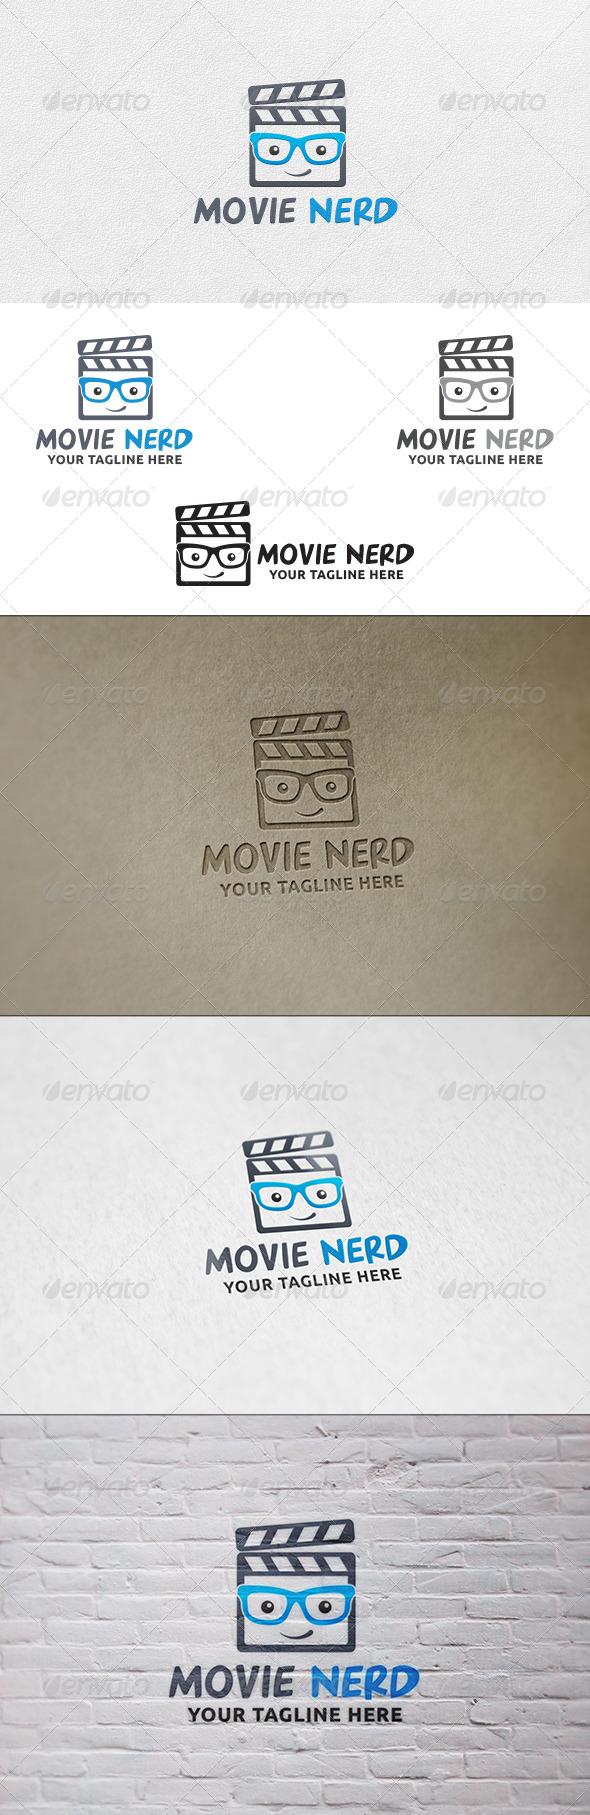 GraphicRiver Movie Nerd Logo Template 6803566